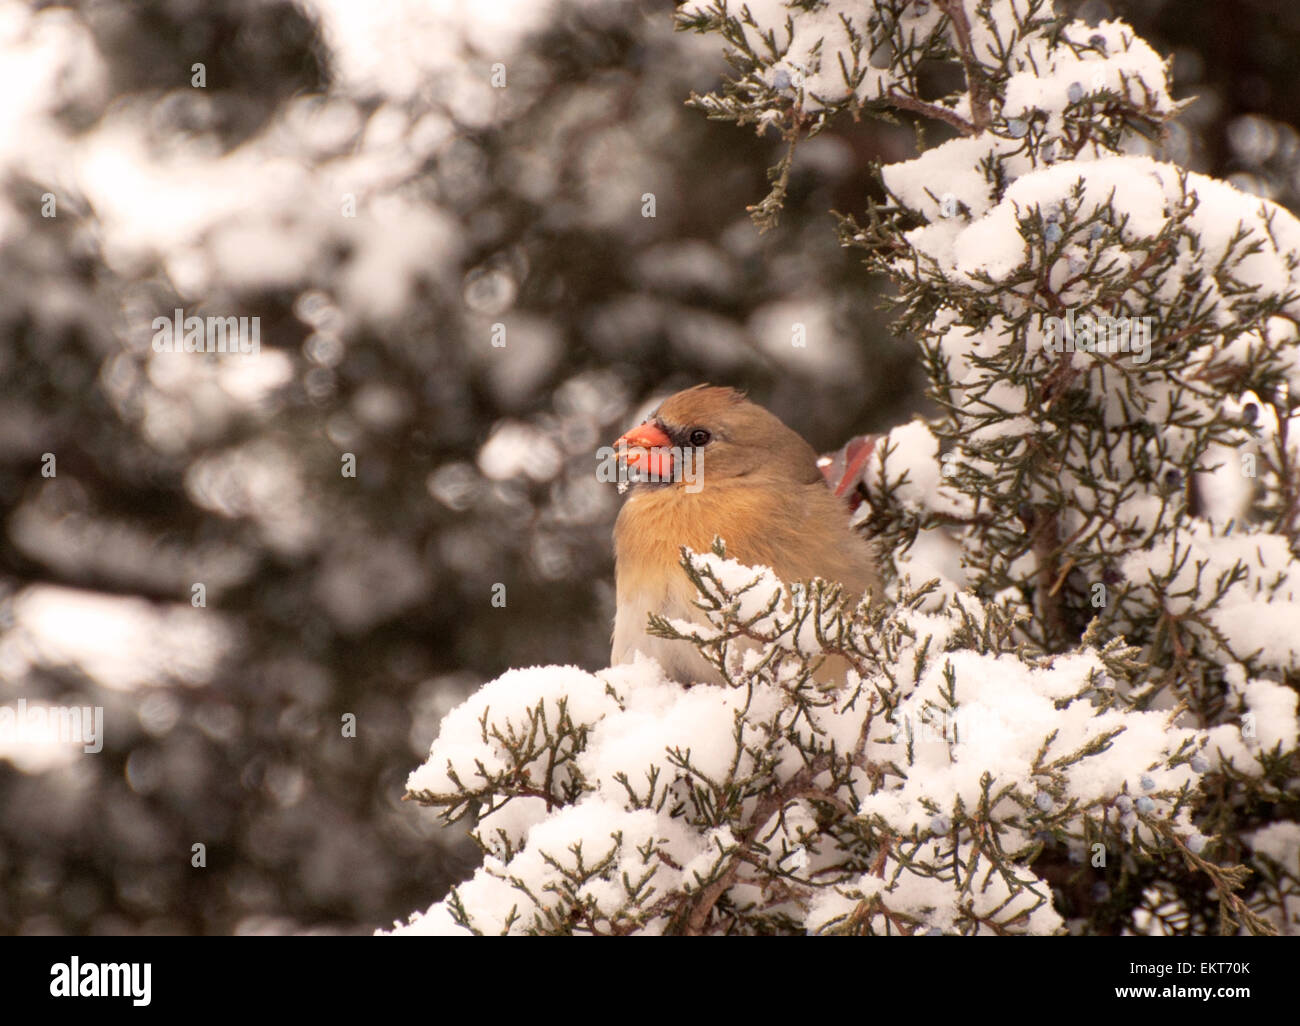 Female cardinal on snow covered cedar branch - Stock Image